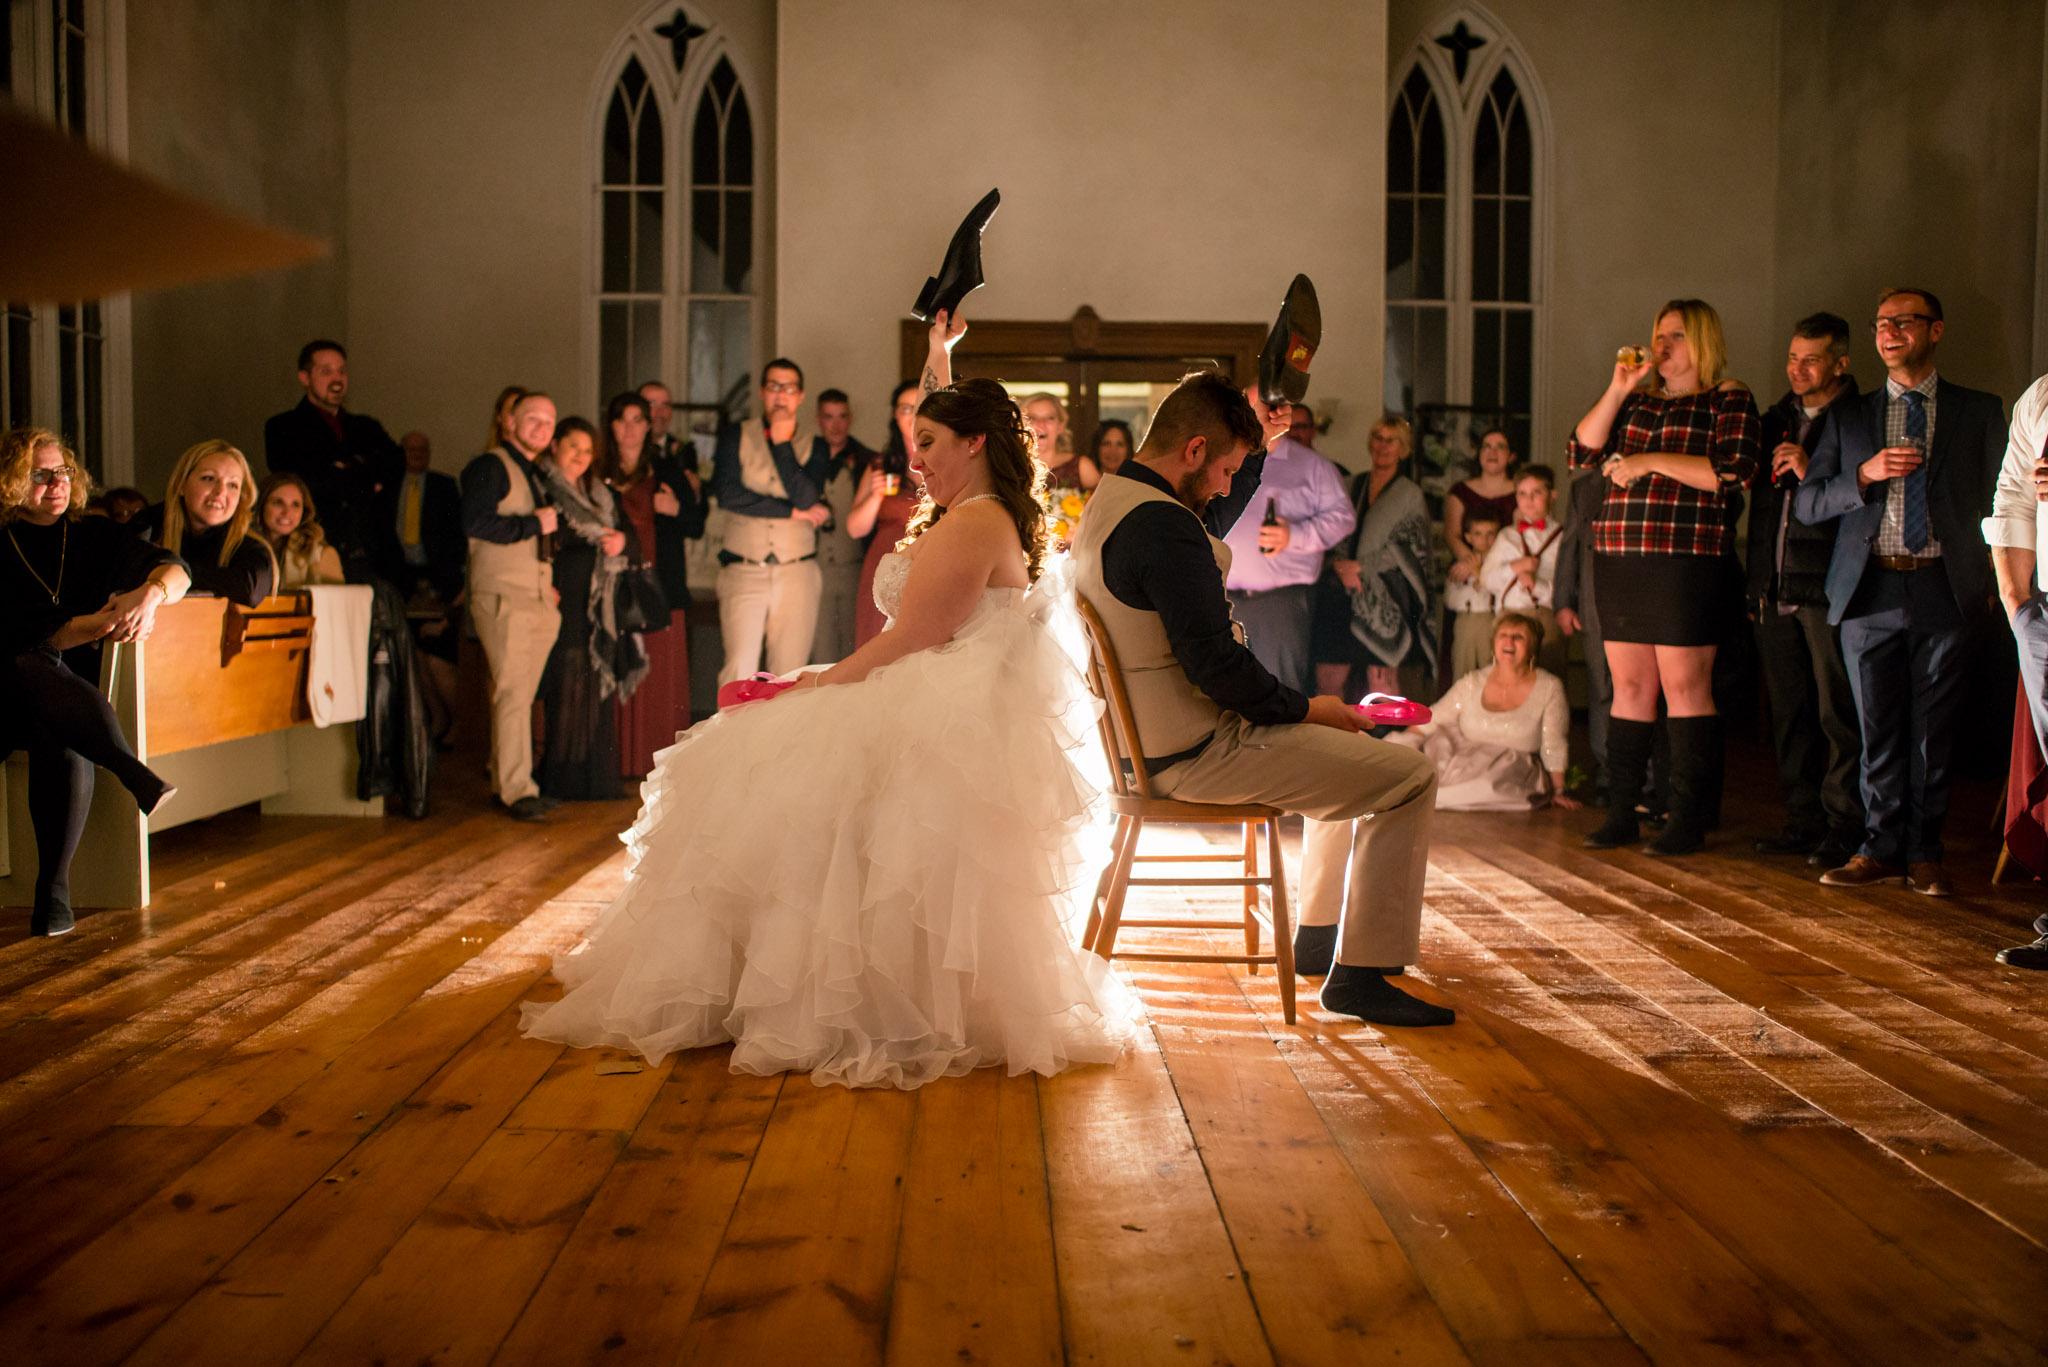 Cranberry-creek-wedding-shoe-game-001.jpg